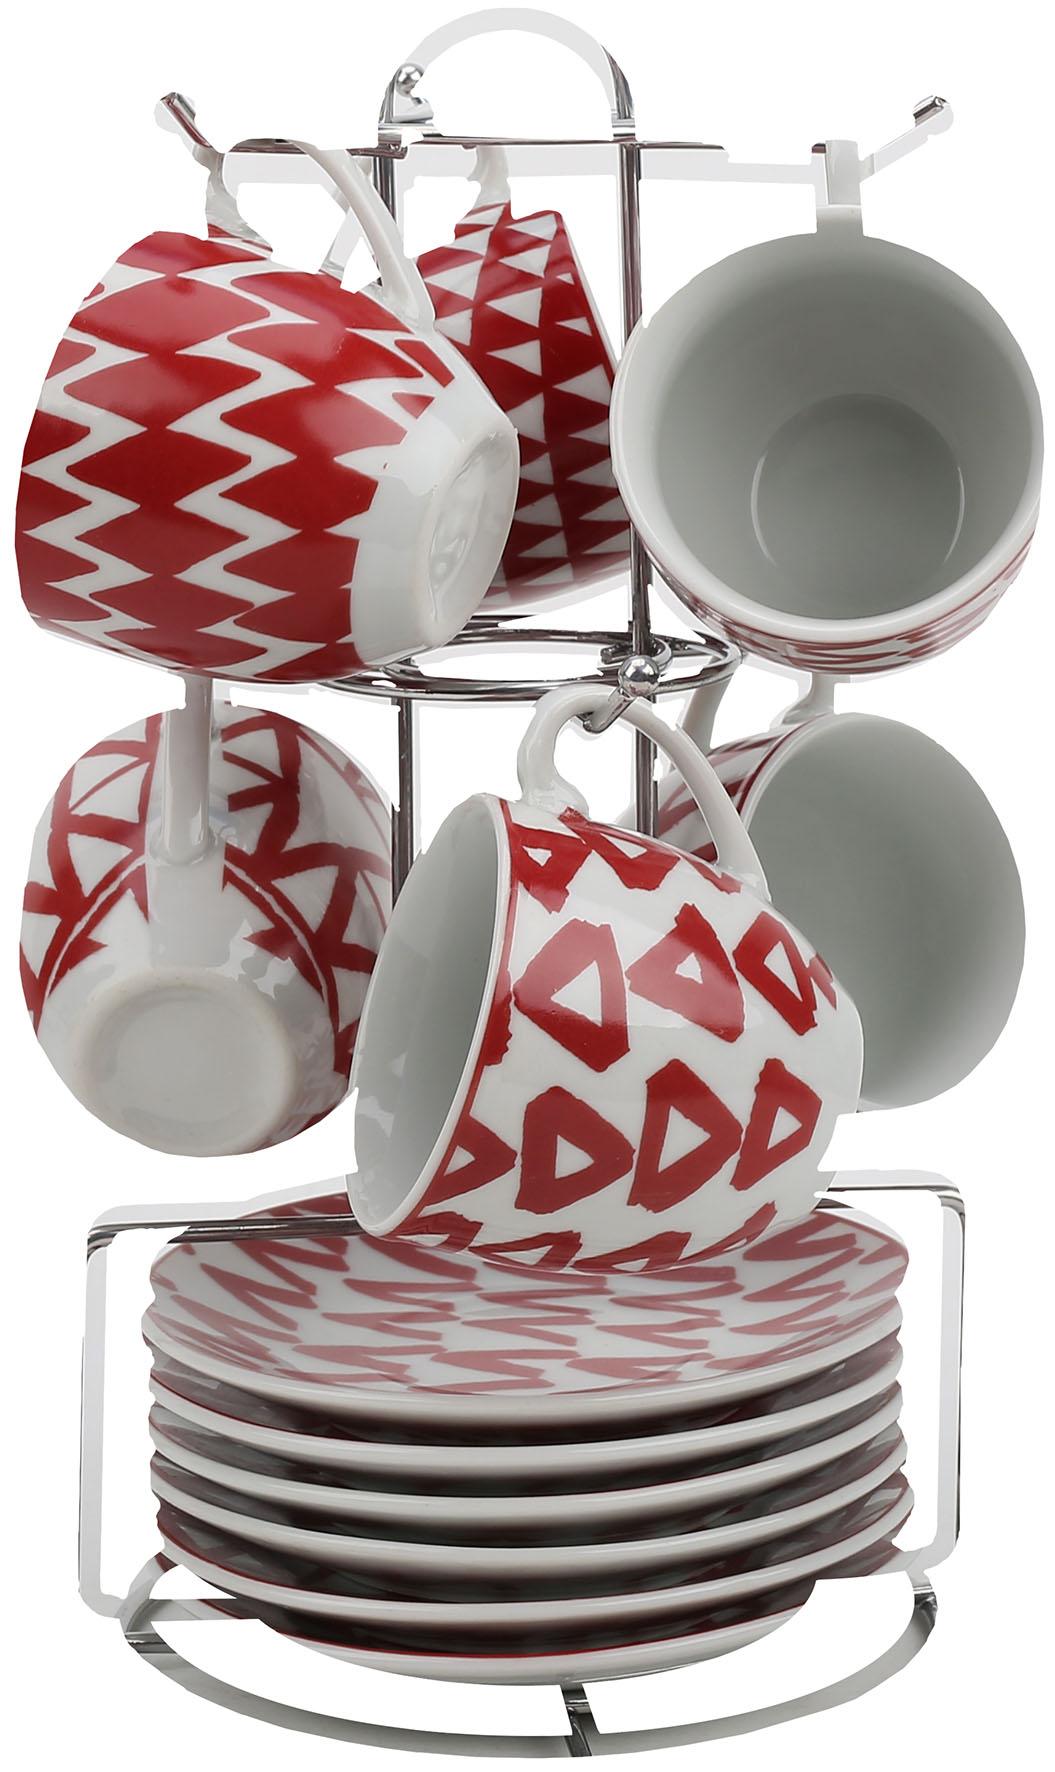 TAZZ CAFFE C P PZ 6 C APP RSO